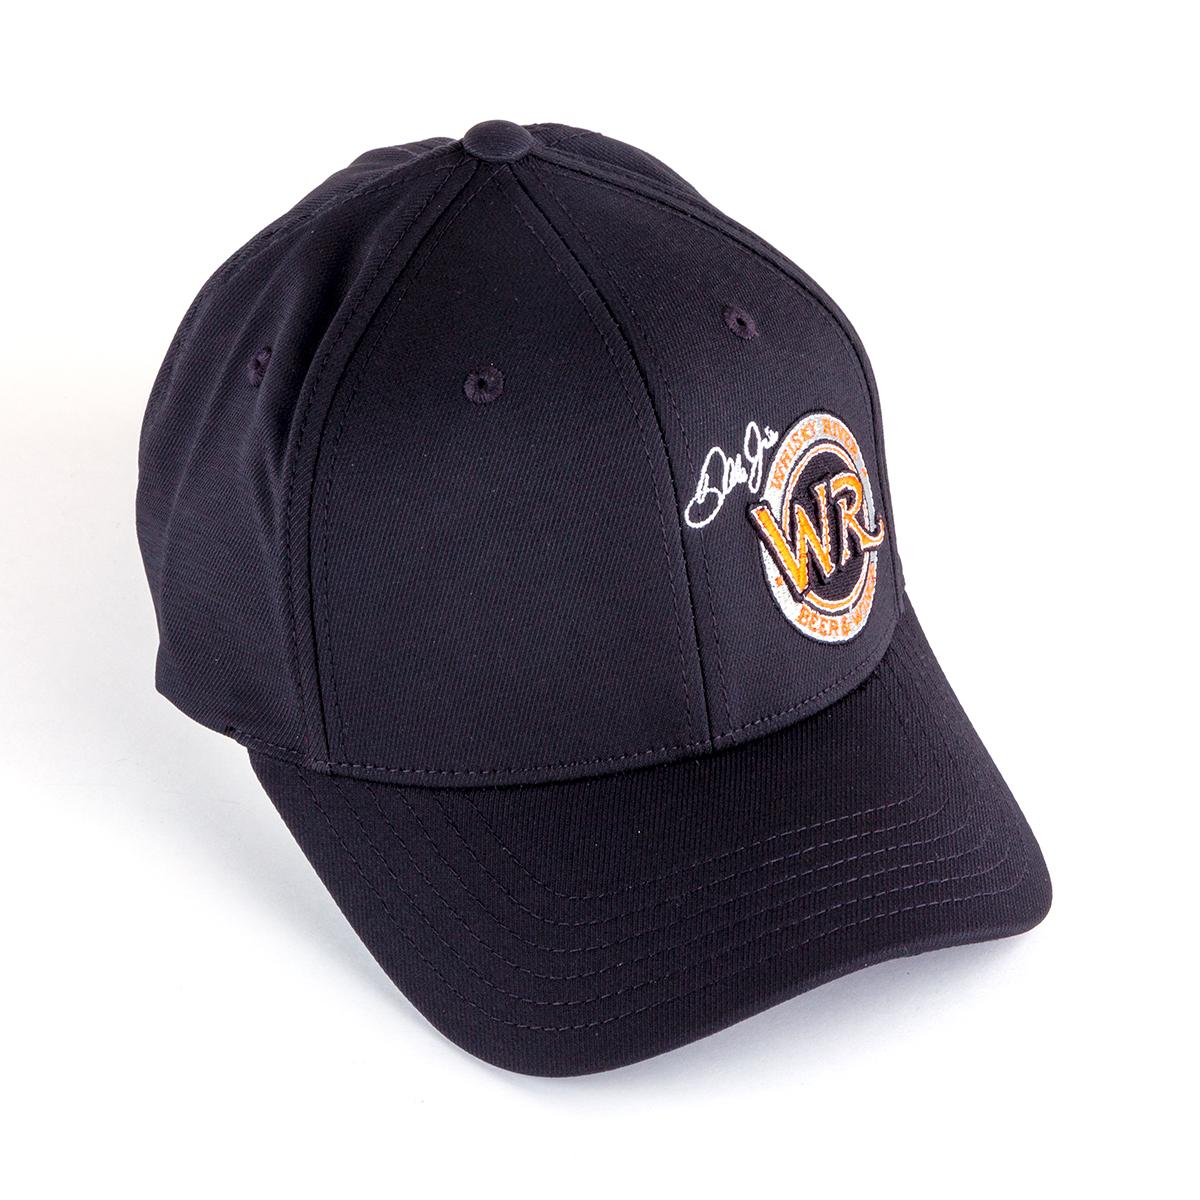 Whisky River Black Performance Hat